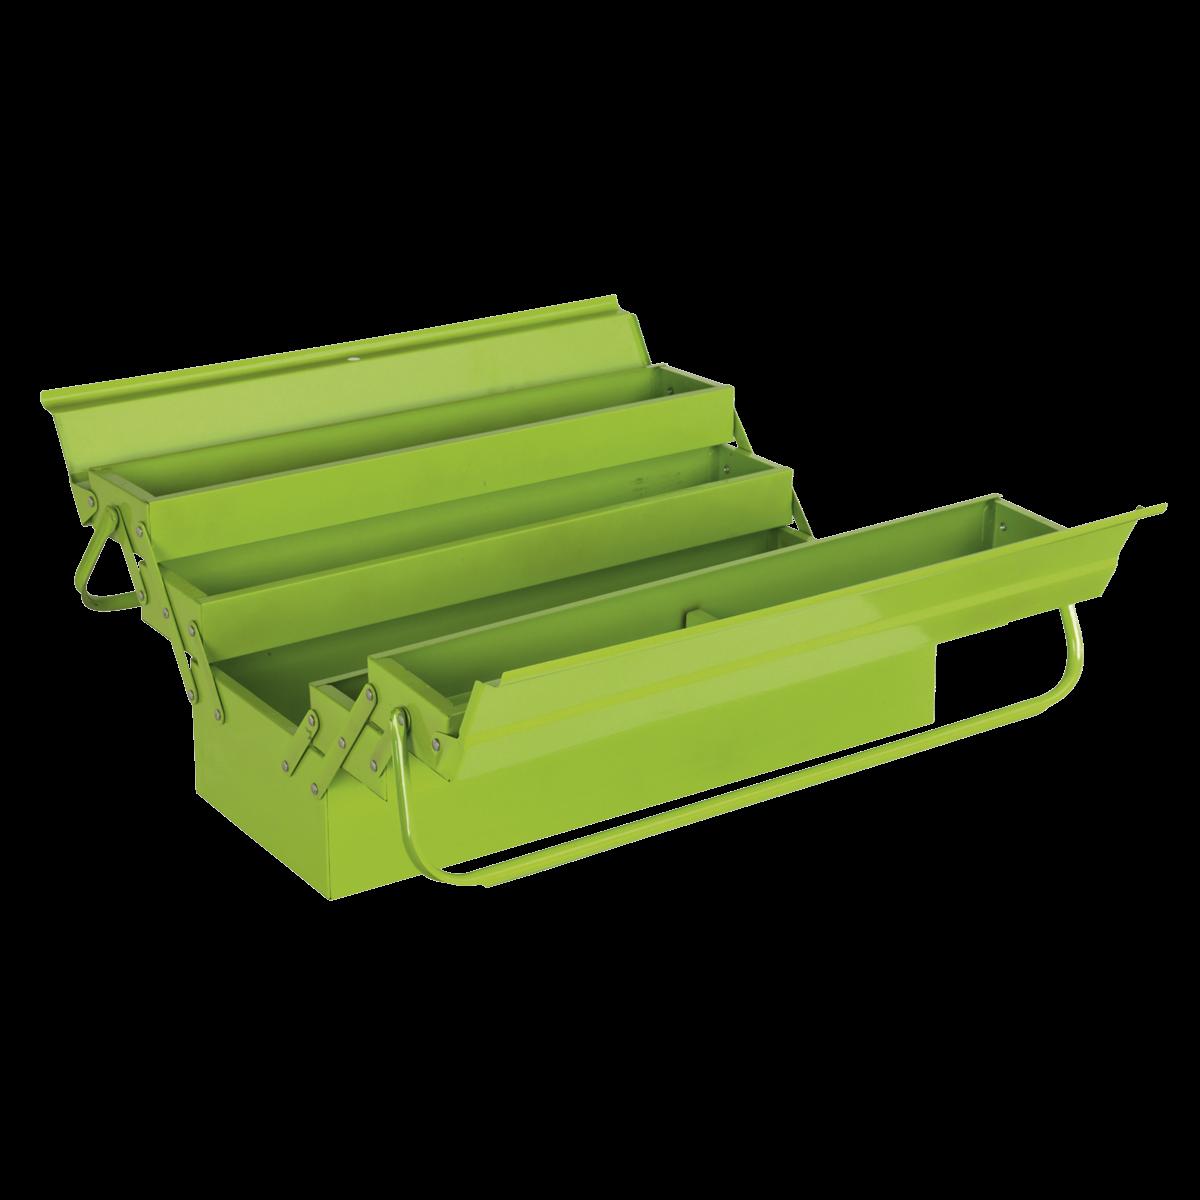 SEALEY CANTILEVER TOOBOX 4 TRAY 530MM HI-VIS GREEN